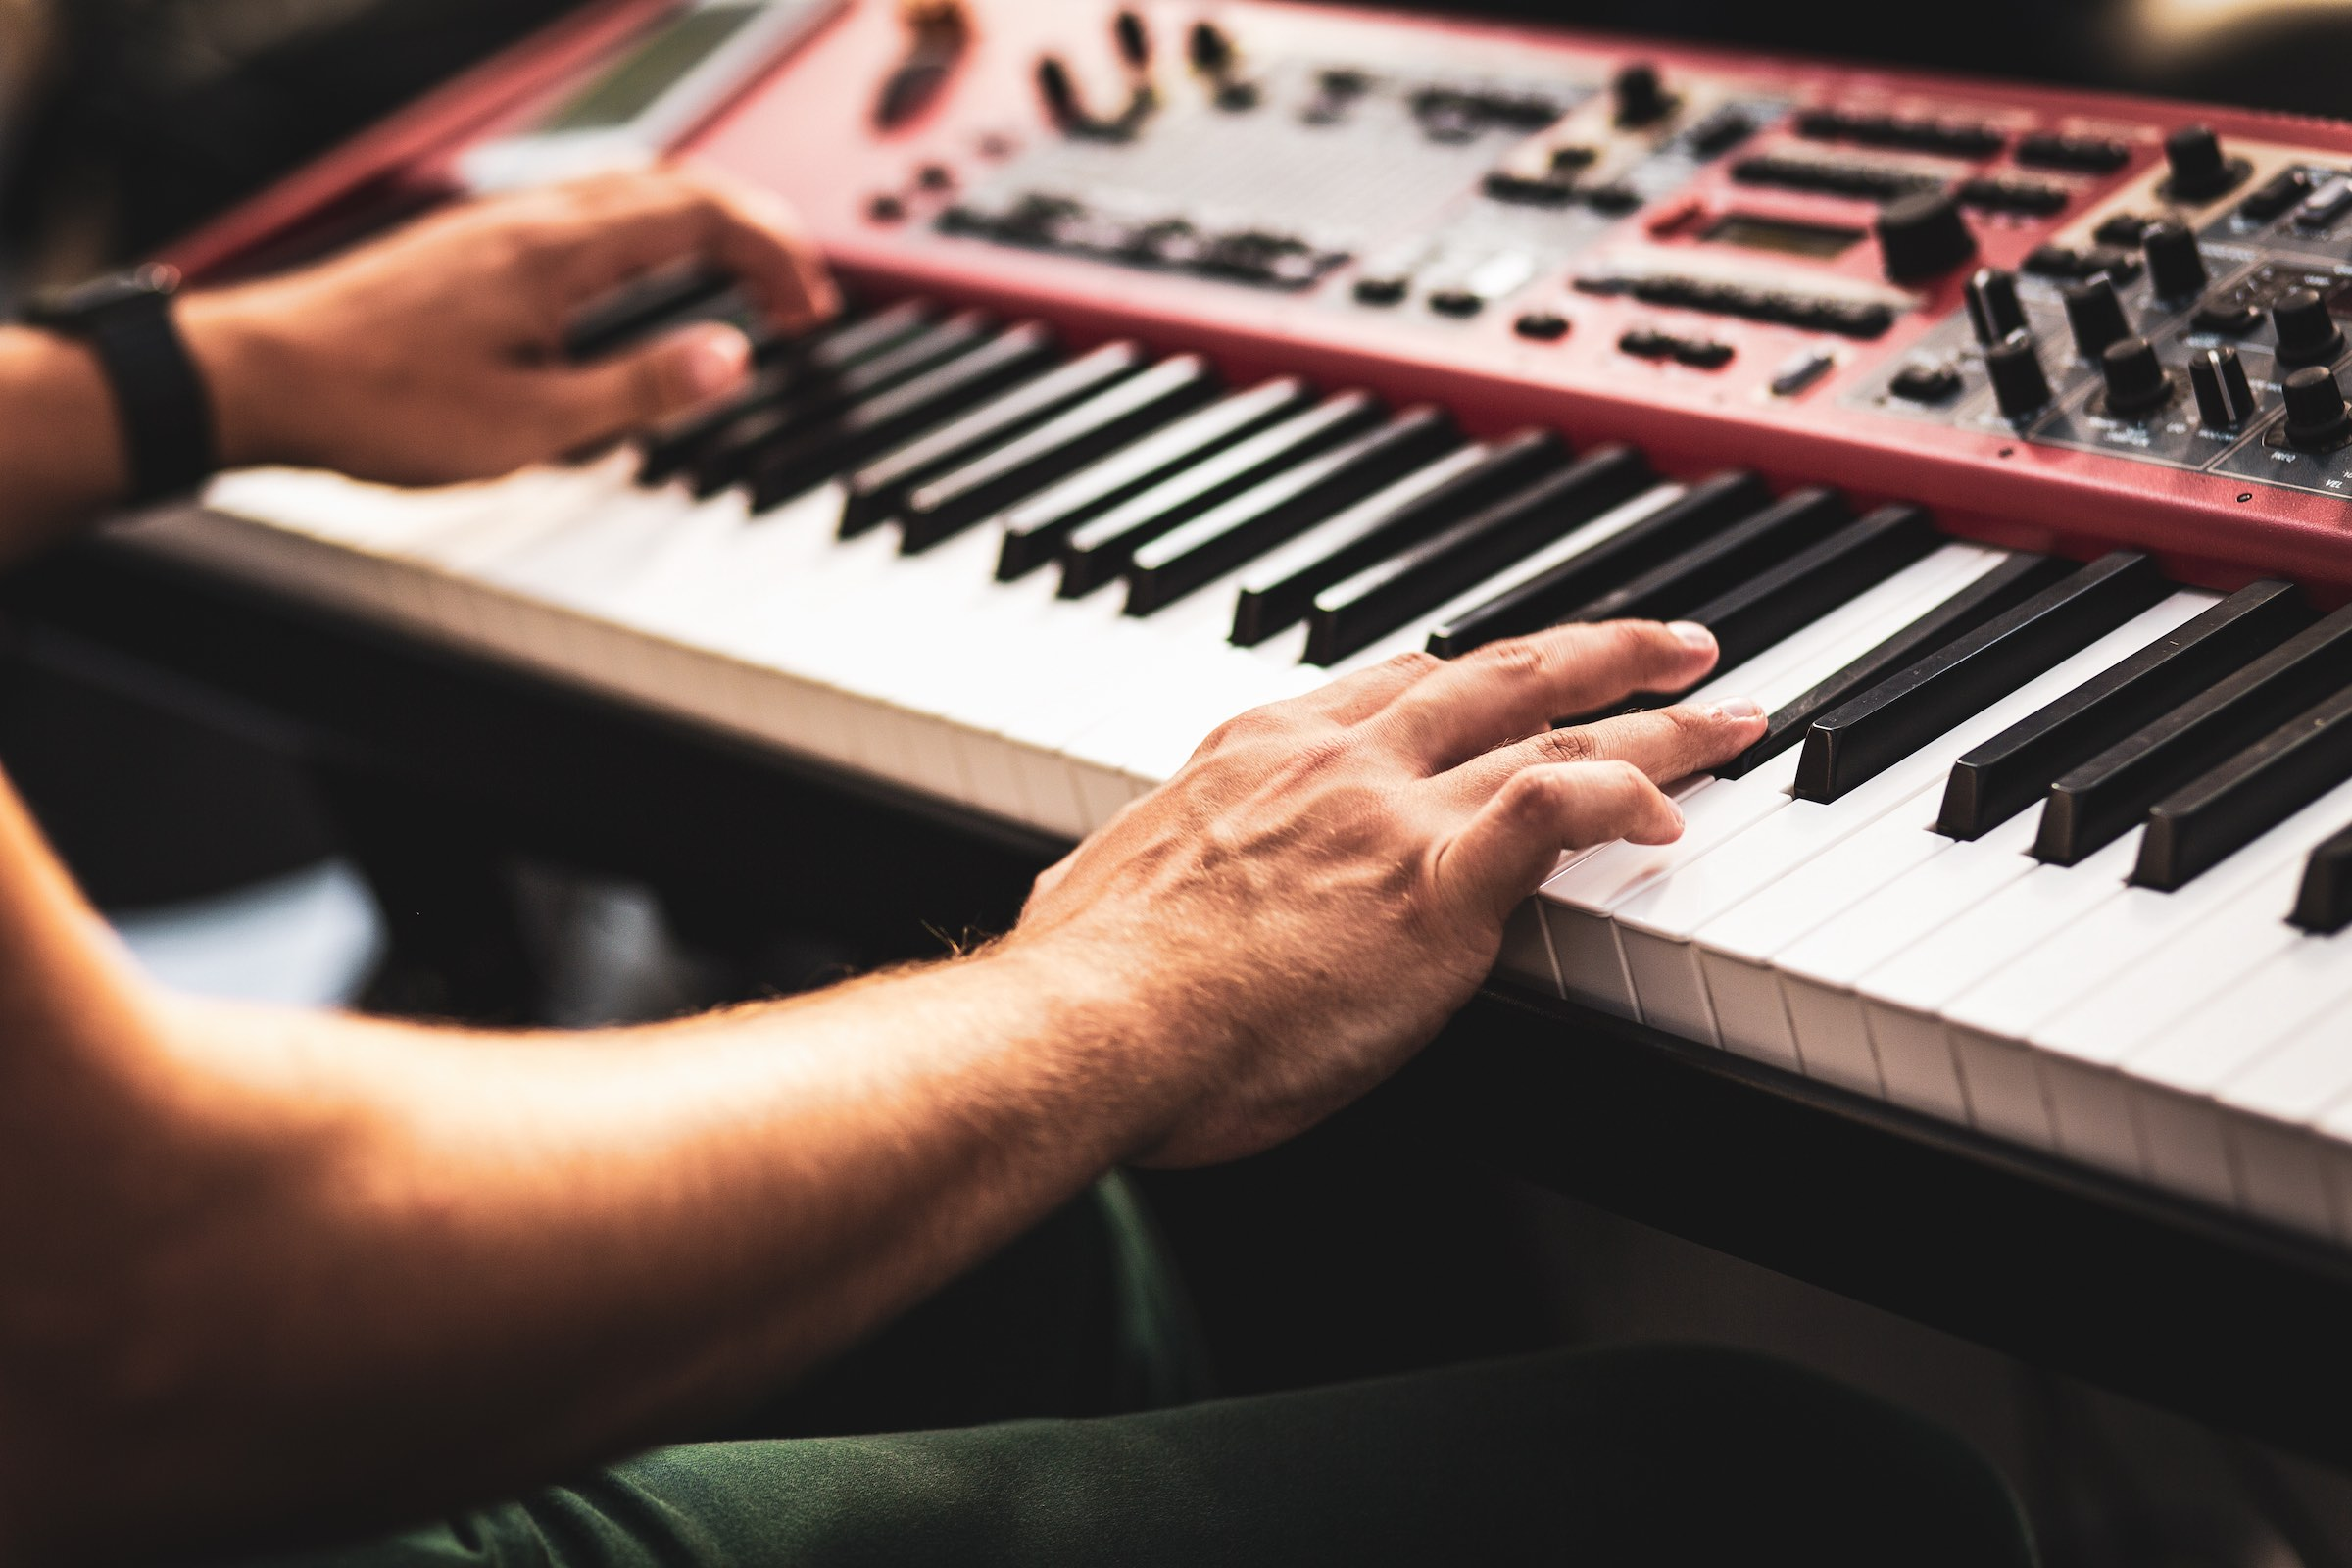 Pianist | Klavierspieler | Barpianist | Barpiano | Hannover | Hochzeit | Trauung | Empfang | Sektempfang | Dinner | Kirche | Buchen | Mieten | Anfragen | Alexander | Barsch | Lehmann | Eventservice